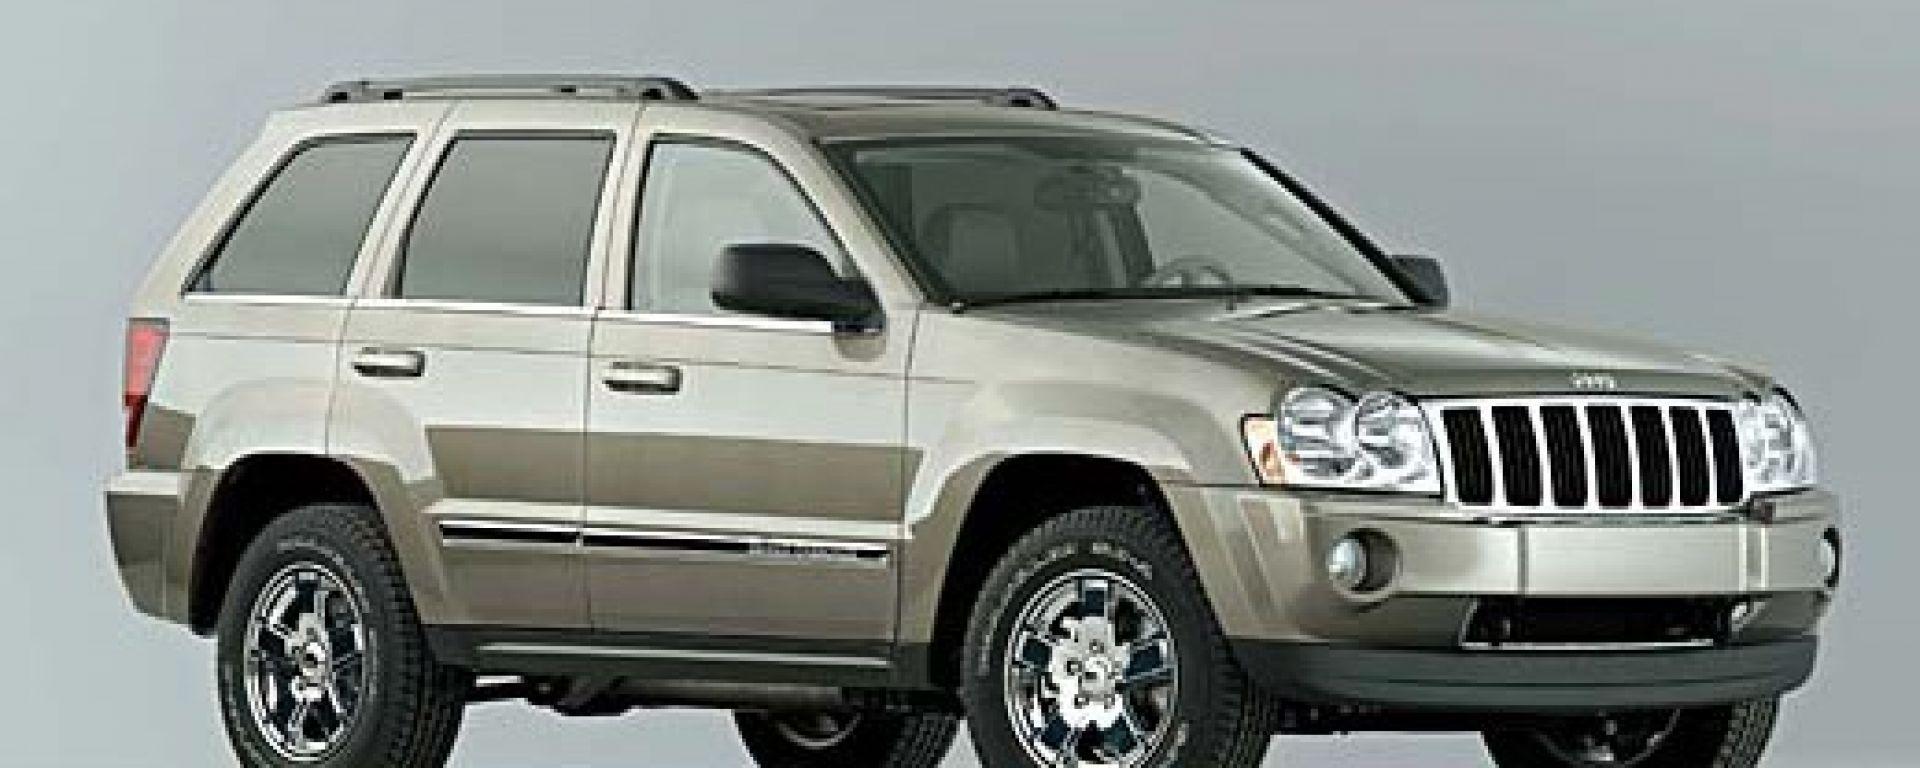 Anteprima jeep grand cherokee 2005